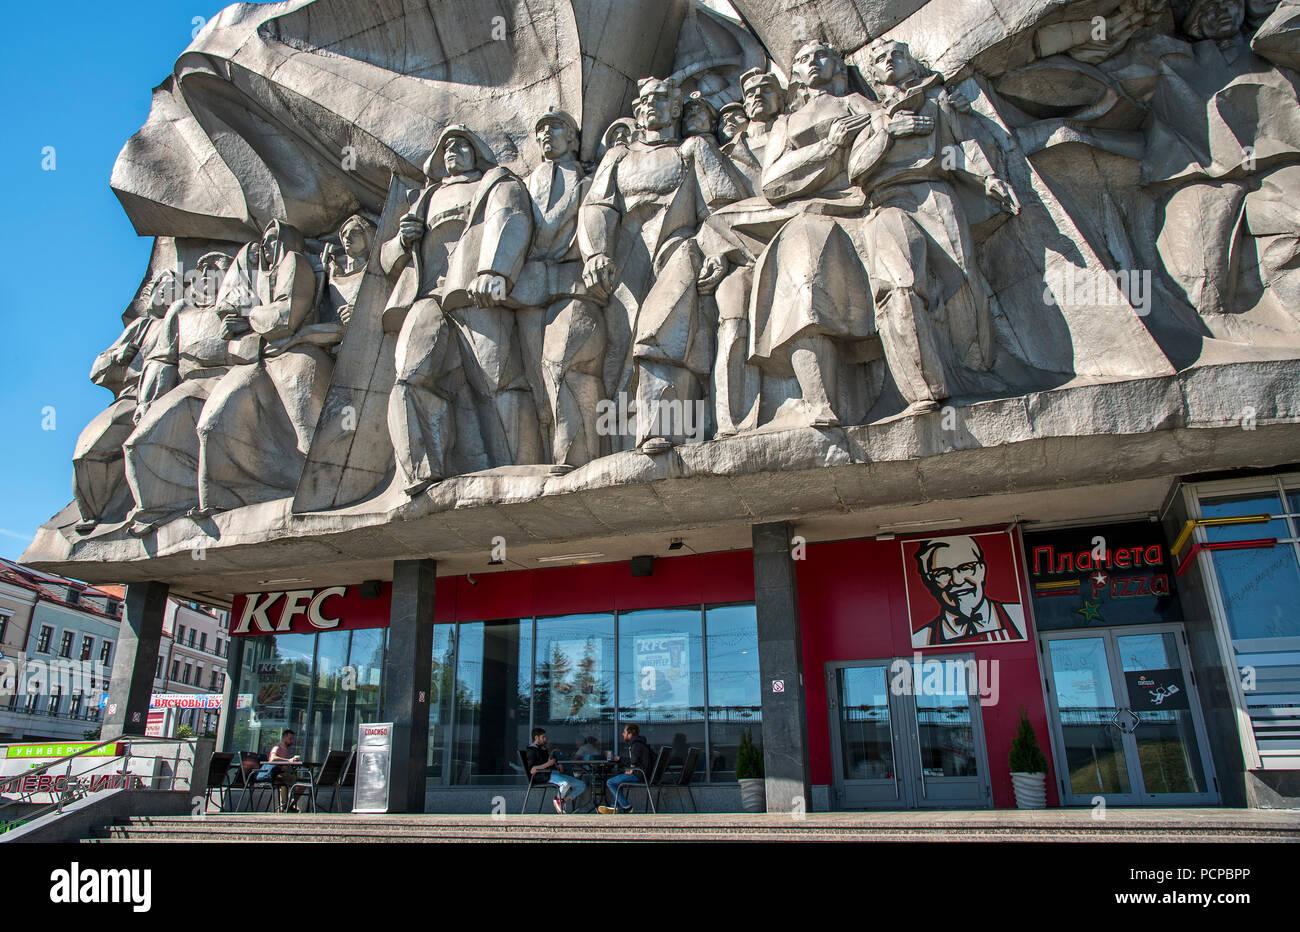 KFC with Soviet Socialist Realism sculpture above. Minsk, Belarus - Stock Image